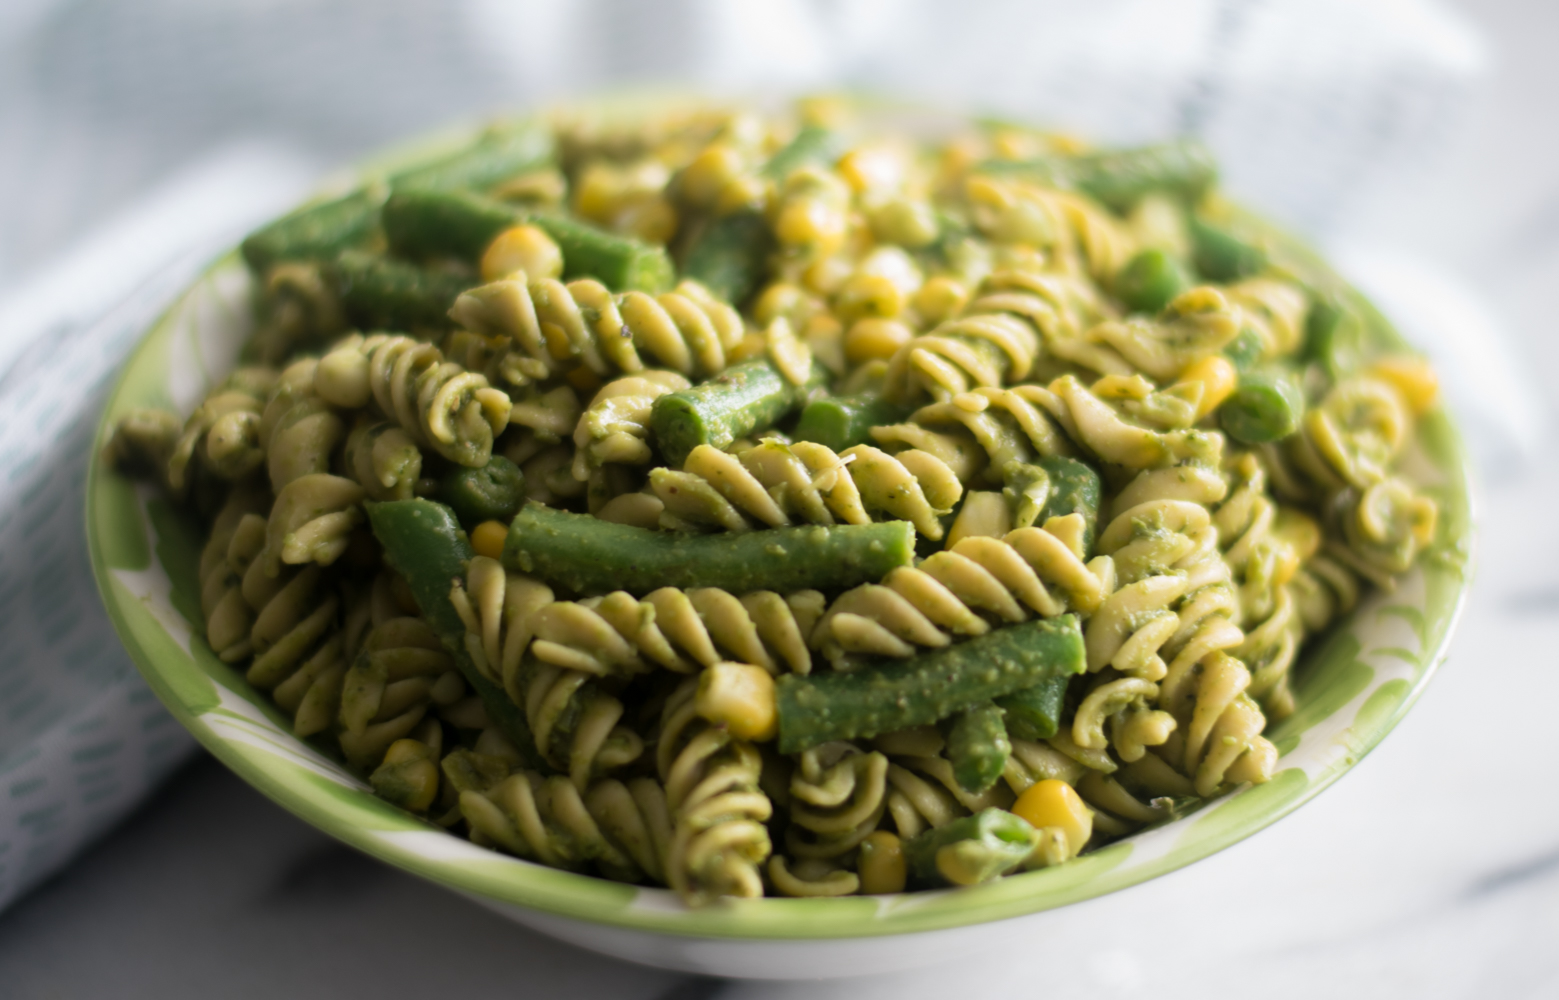 This Easy Vegan Pesto Pasta Salad is perfect for BBQs and potlucks!